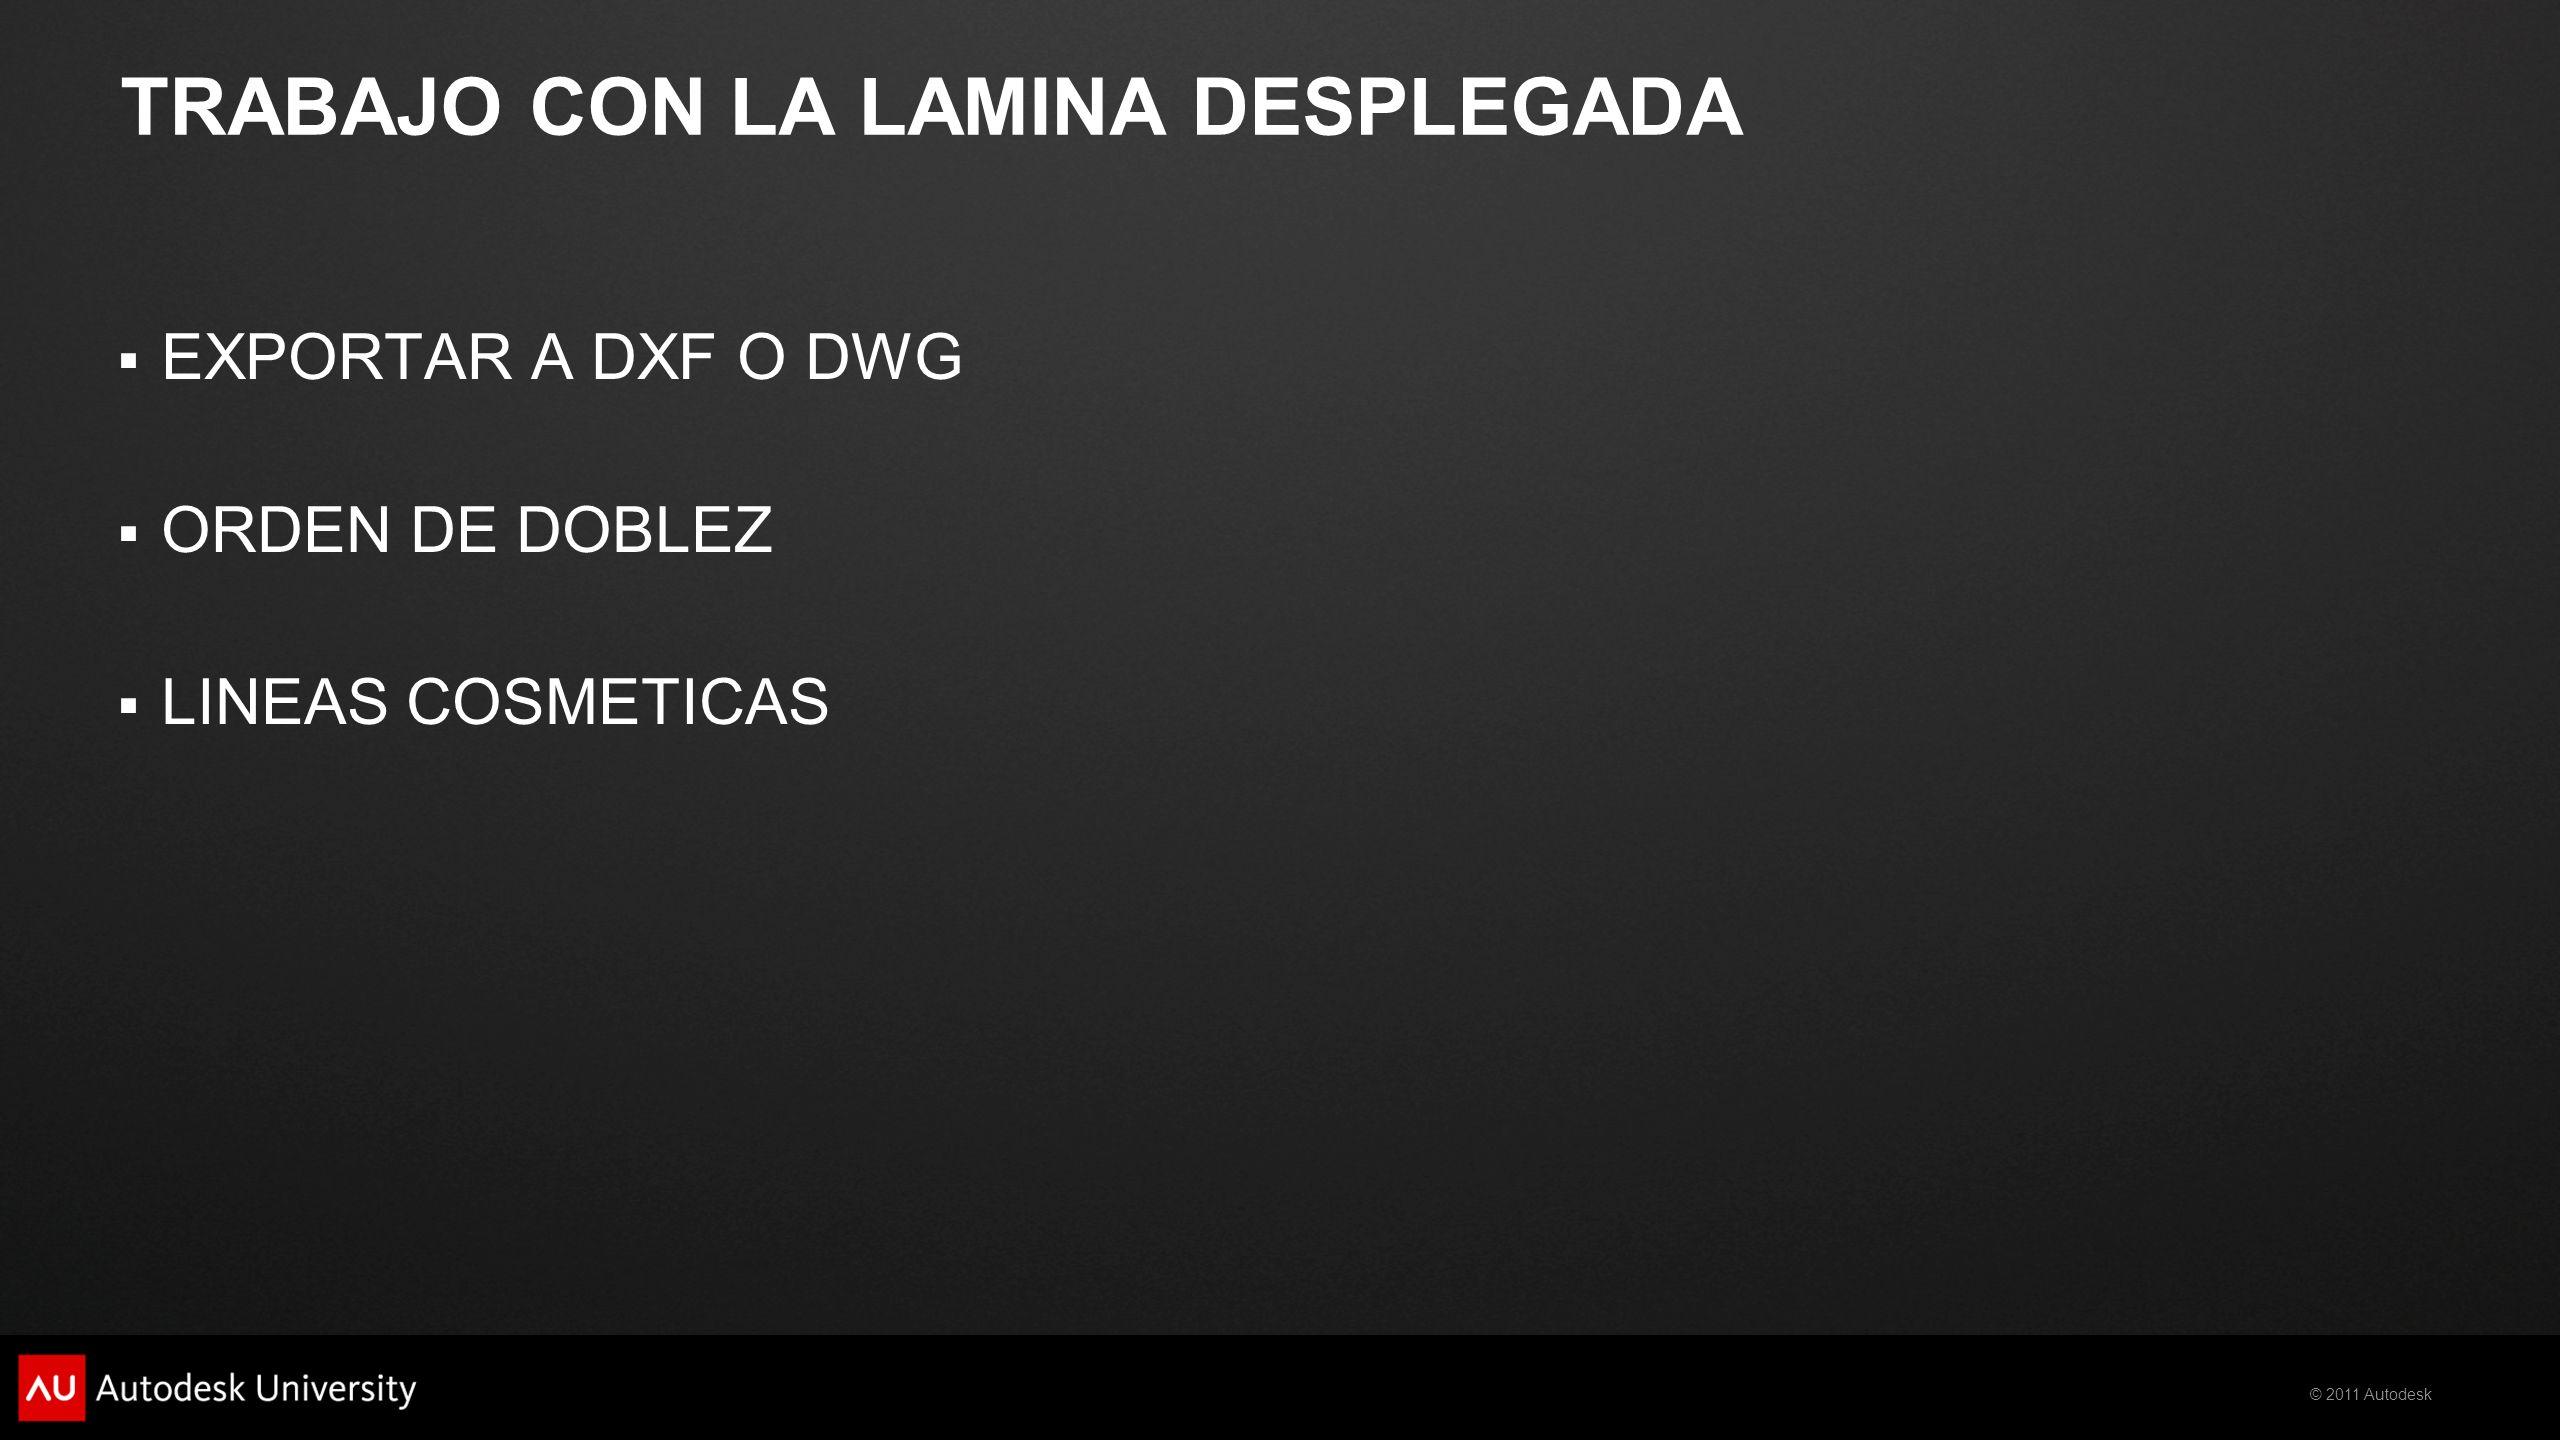 © 2011 Autodesk TRABAJO CON LA LAMINA DESPLEGADA EXPORTAR A DXF O DWG ORDEN DE DOBLEZ LINEAS COSMETICAS